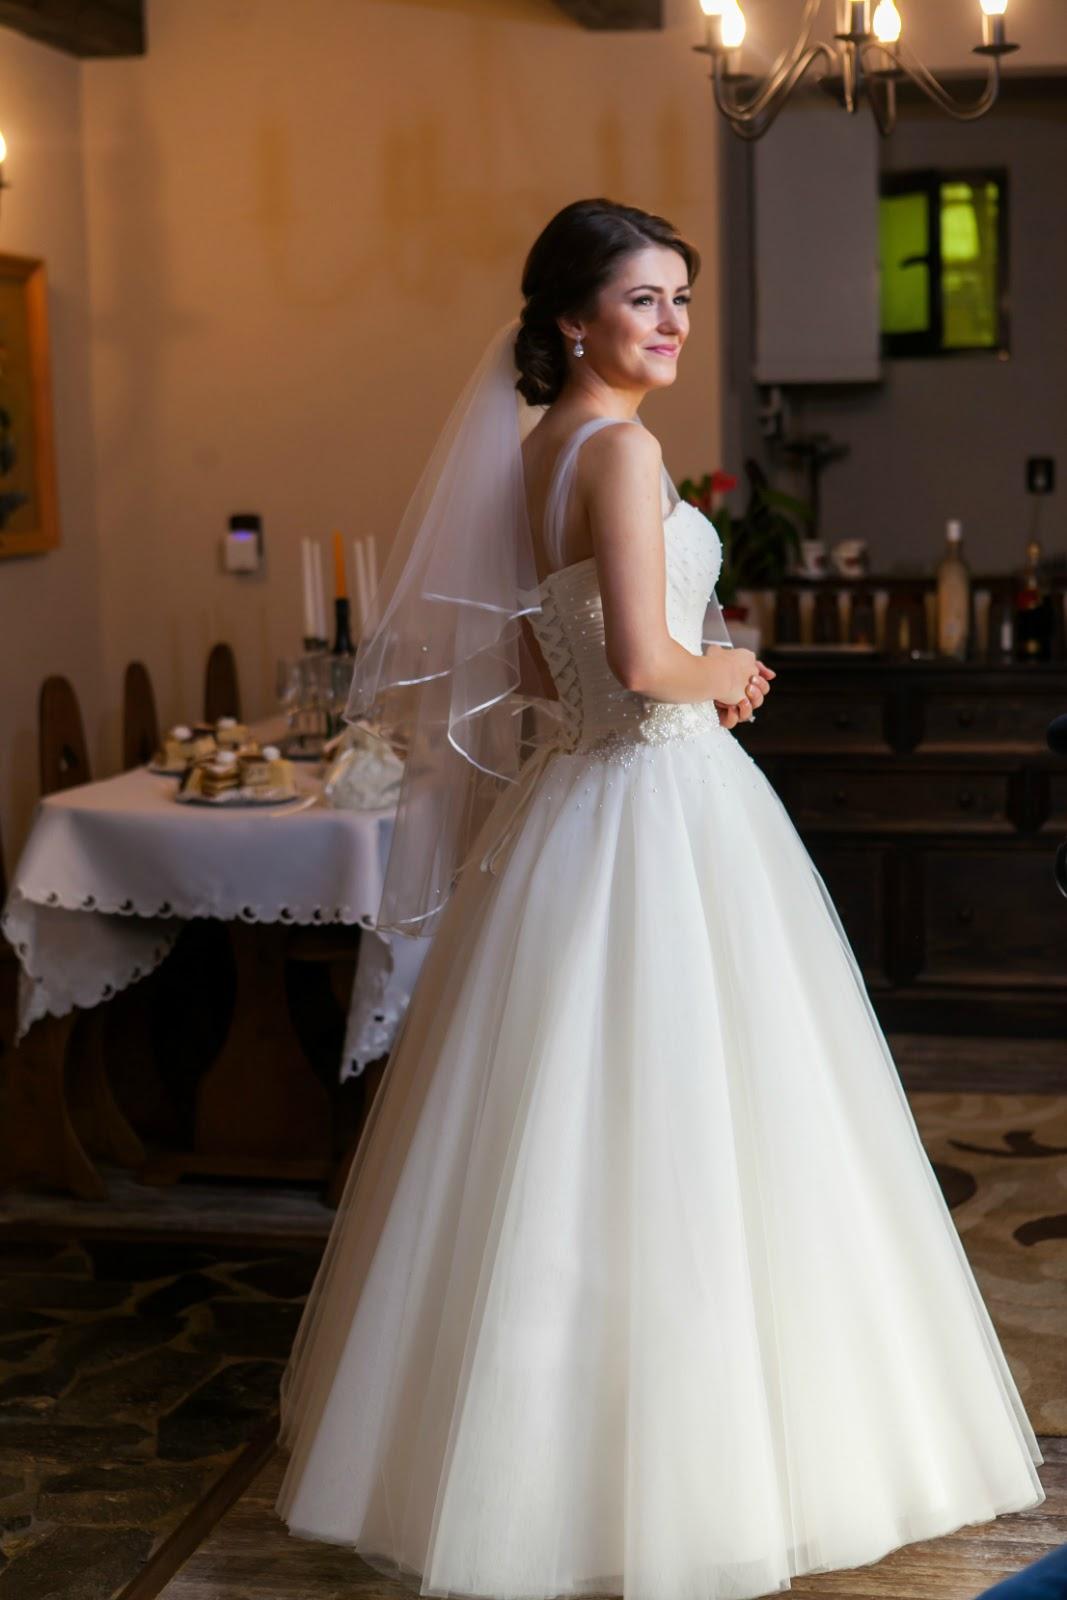 princess wedding bride dress with pearl bodice